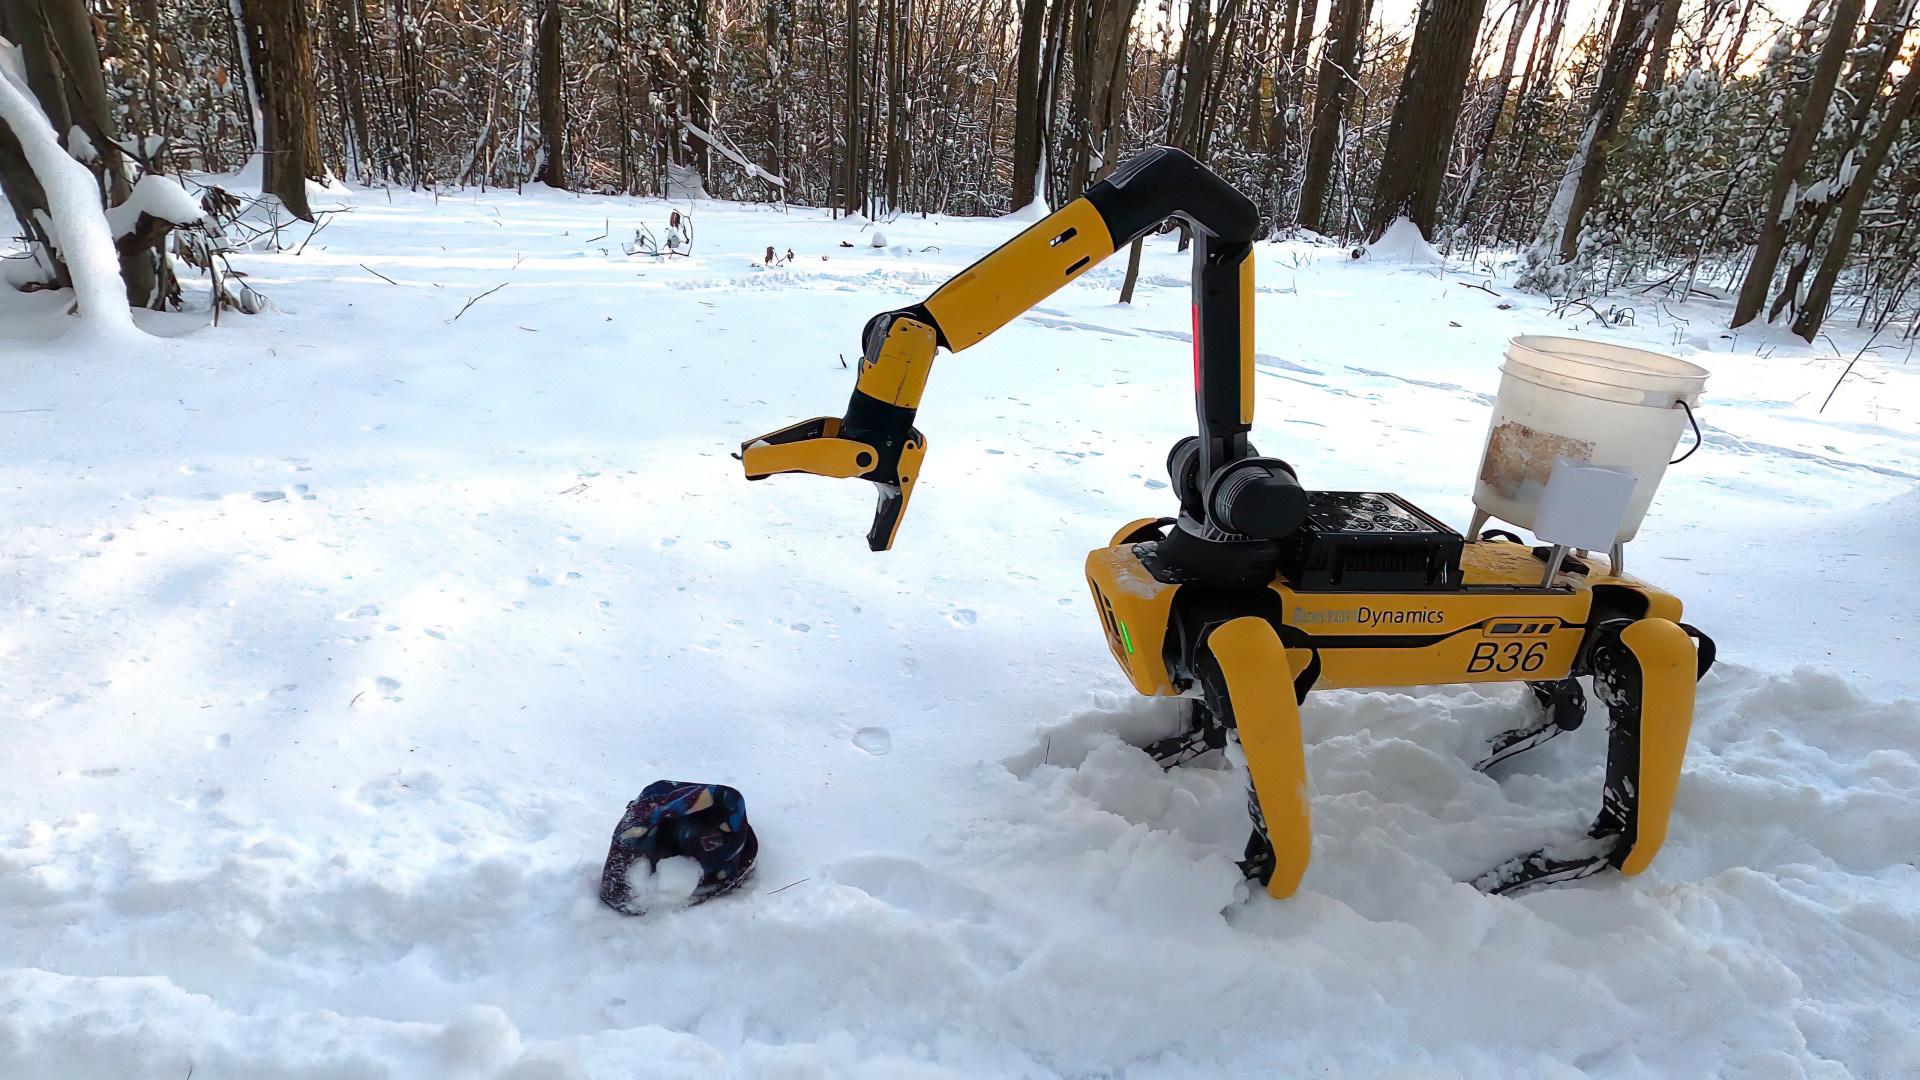 Forschung, Ki, Künstliche Intelligenz, Roboter, Robotik, Spot, Boston Dynamics